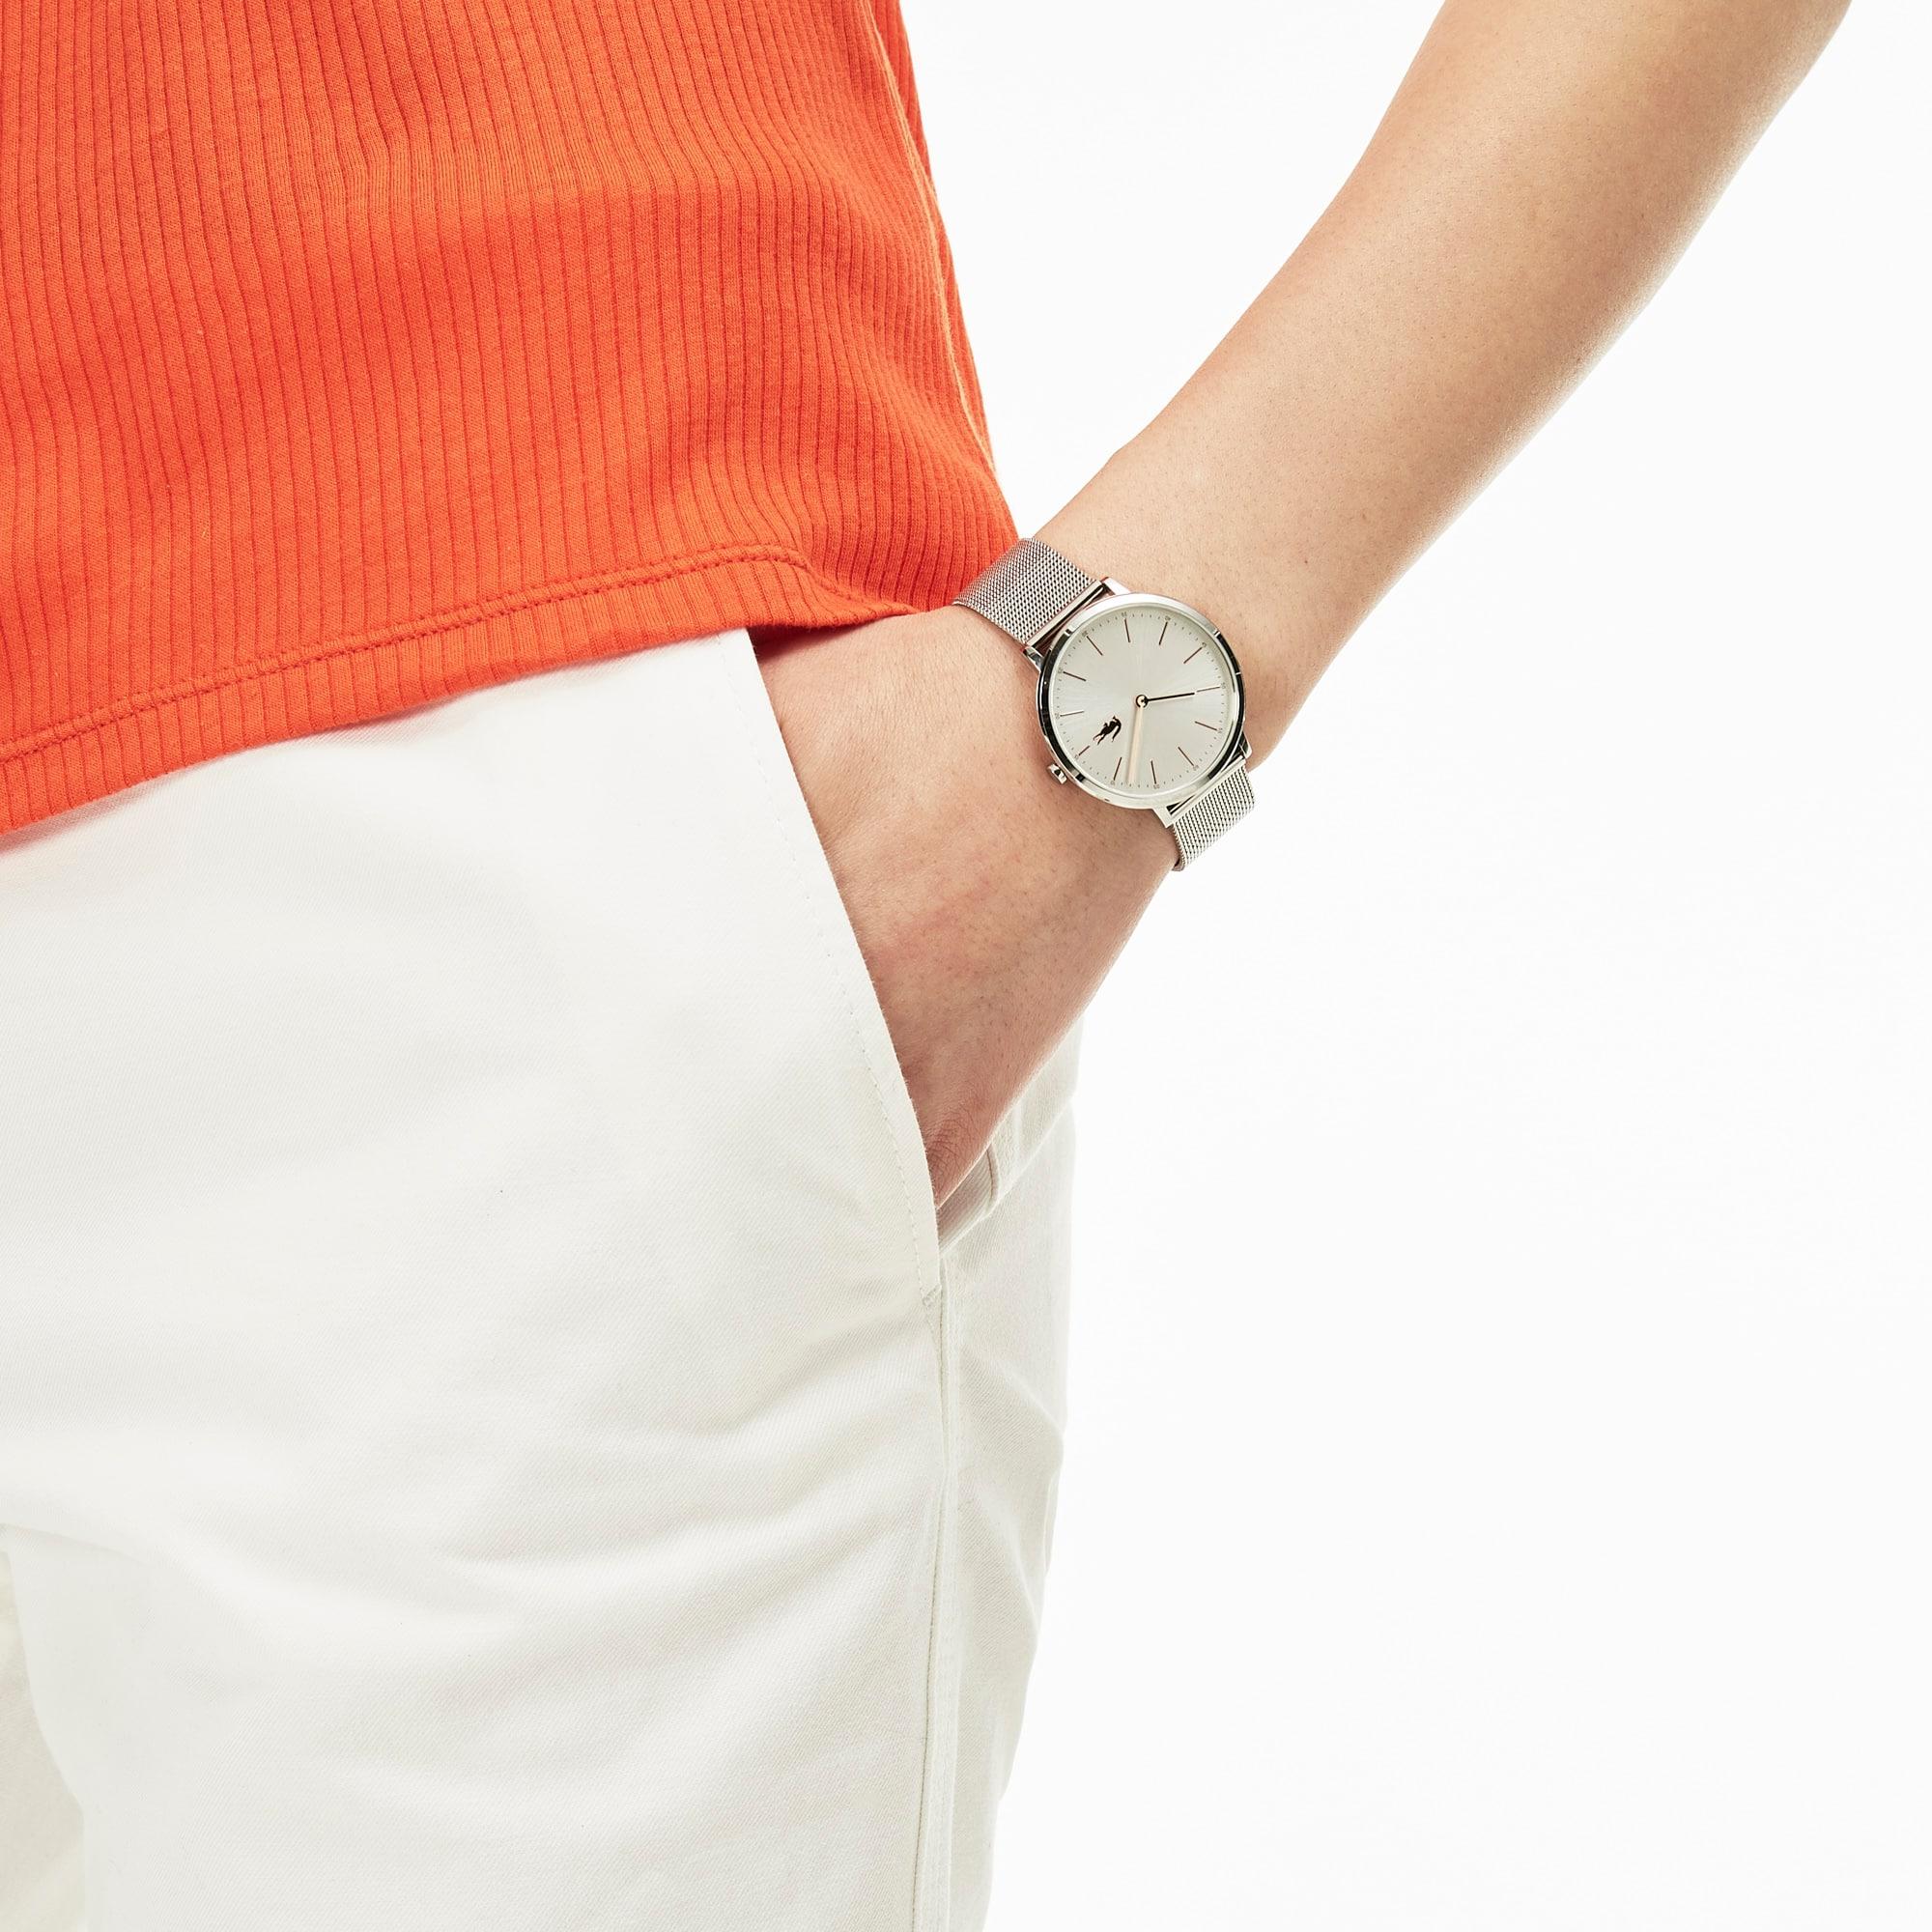 Montre Moon Ultrafine Femme avec Bracelet en Mesh d'Acier Inoxydable